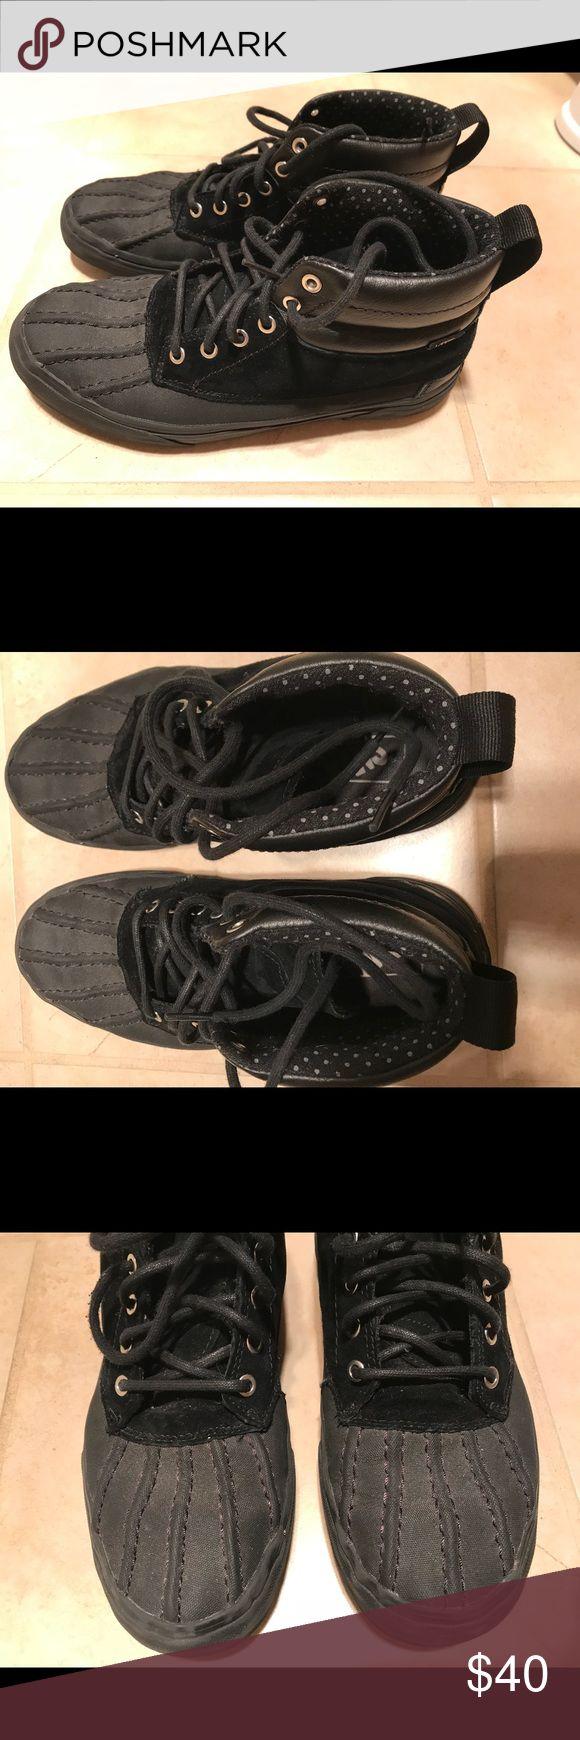 Vans Waterproof Sneaker Boots Ladies 9.5, Men's 8 Vans SCOTCHGARD SK8-HI DEL PATO MTE, unisex, female worn, used but show little wear, super comfy and nice for wider feet :) Vans Shoes Winter & Rain Boots